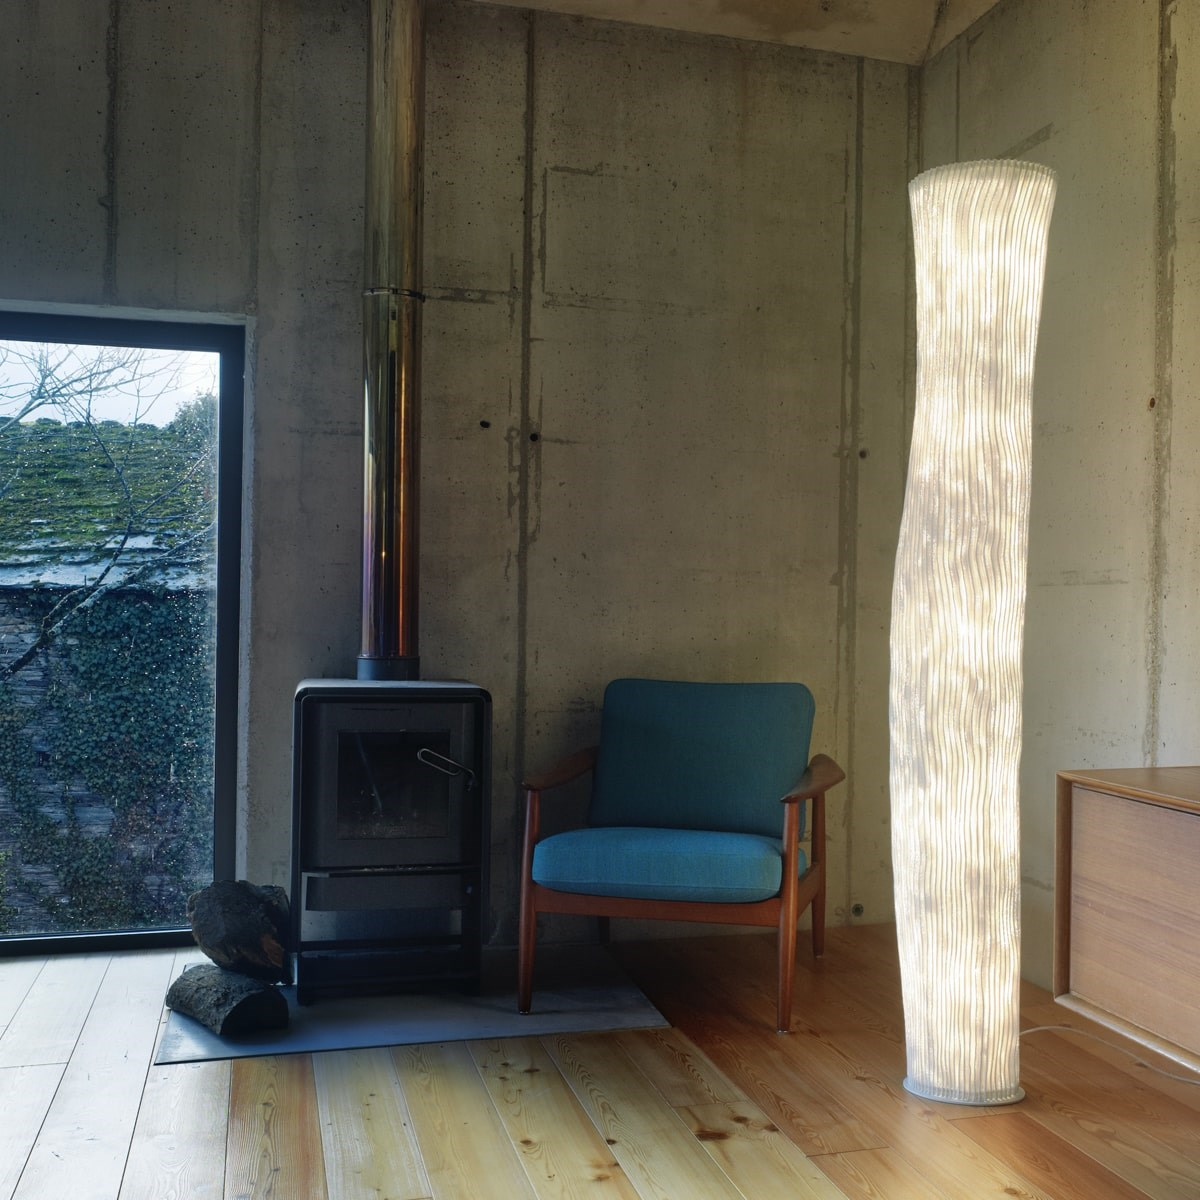 Arturo-Alvarez-Gea-Floor-Light-Matisse-3